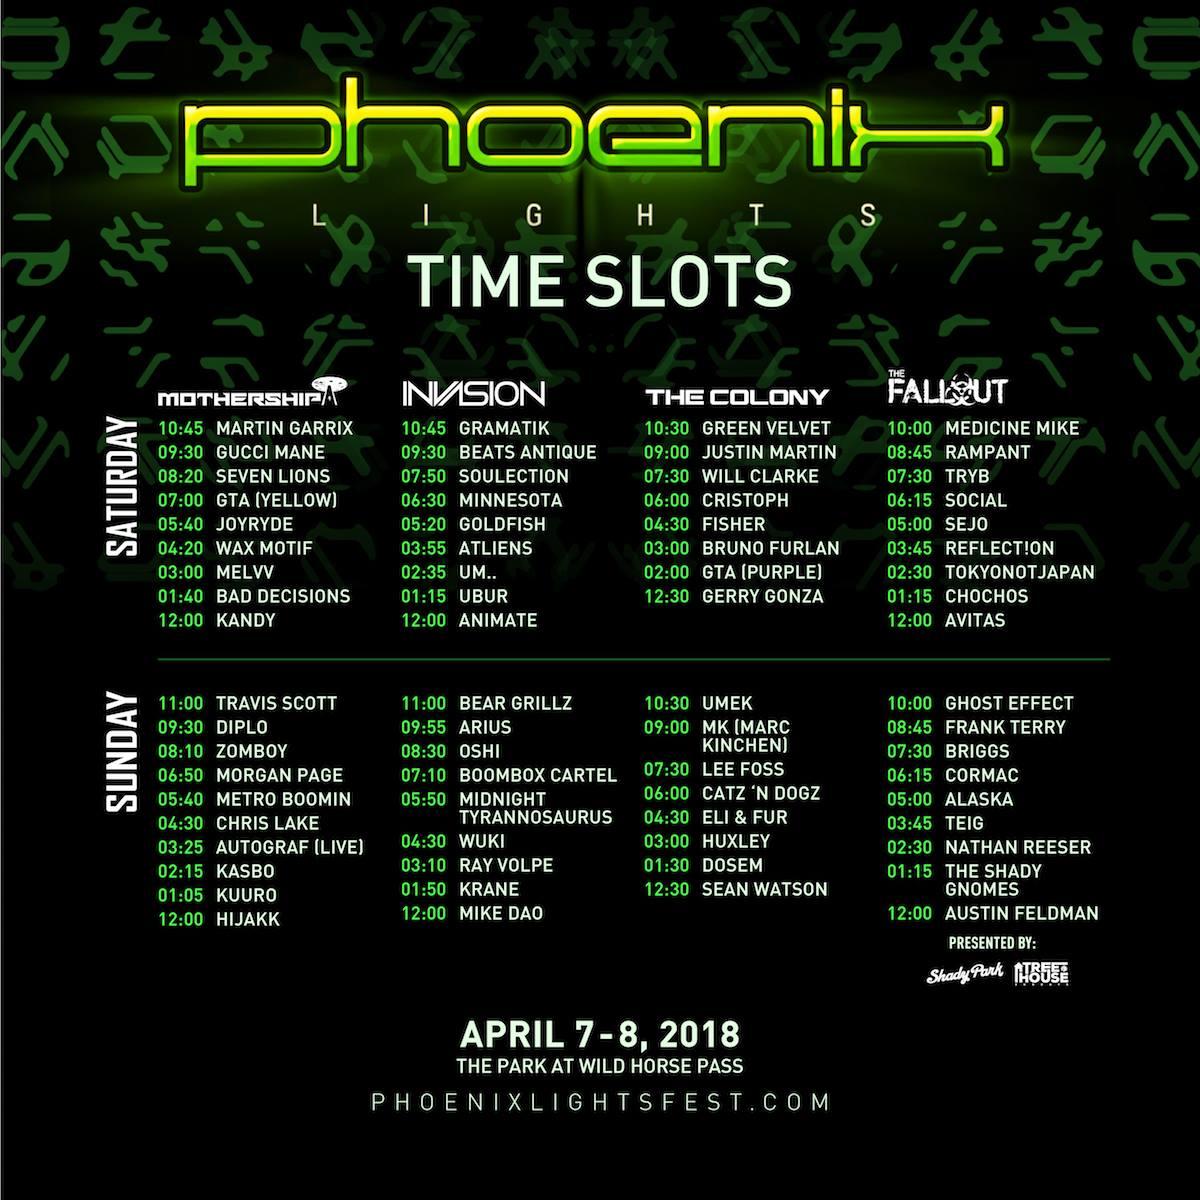 Phoenix Lights Festival 2018 Set Times